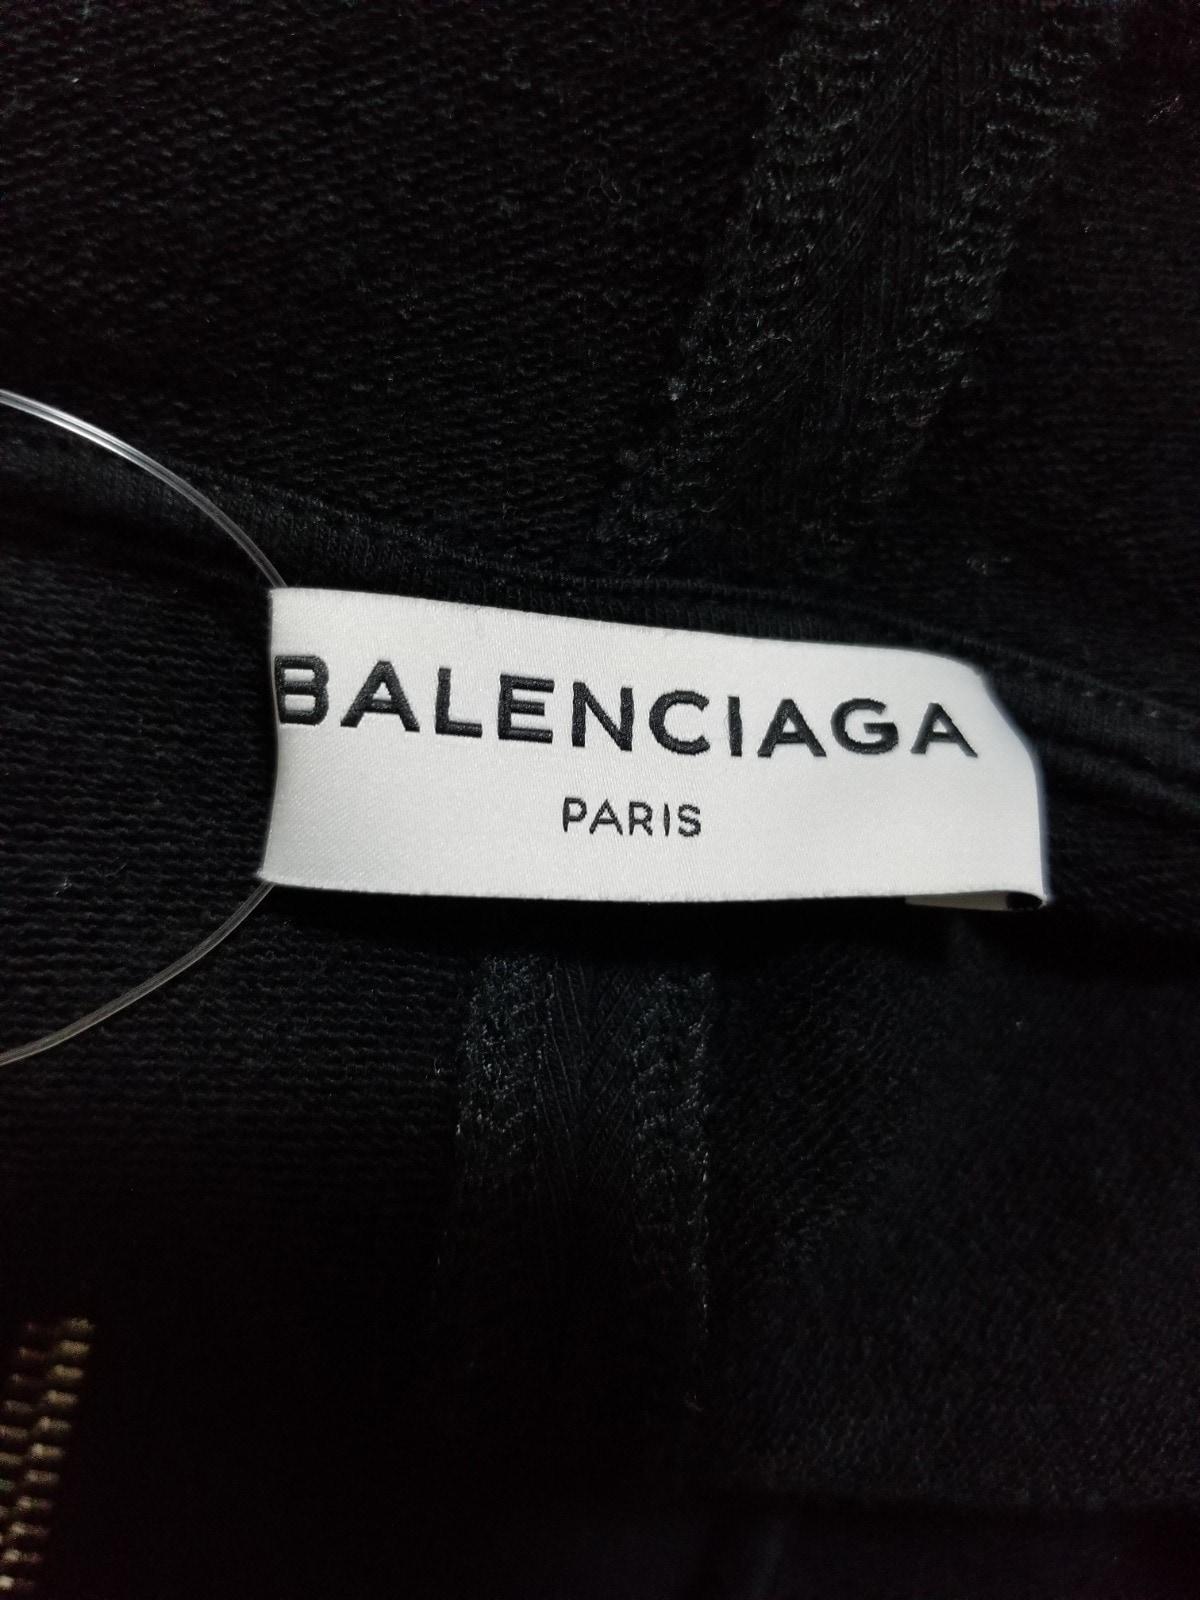 BALENCIAGA(バレンシアガ)のパーカー